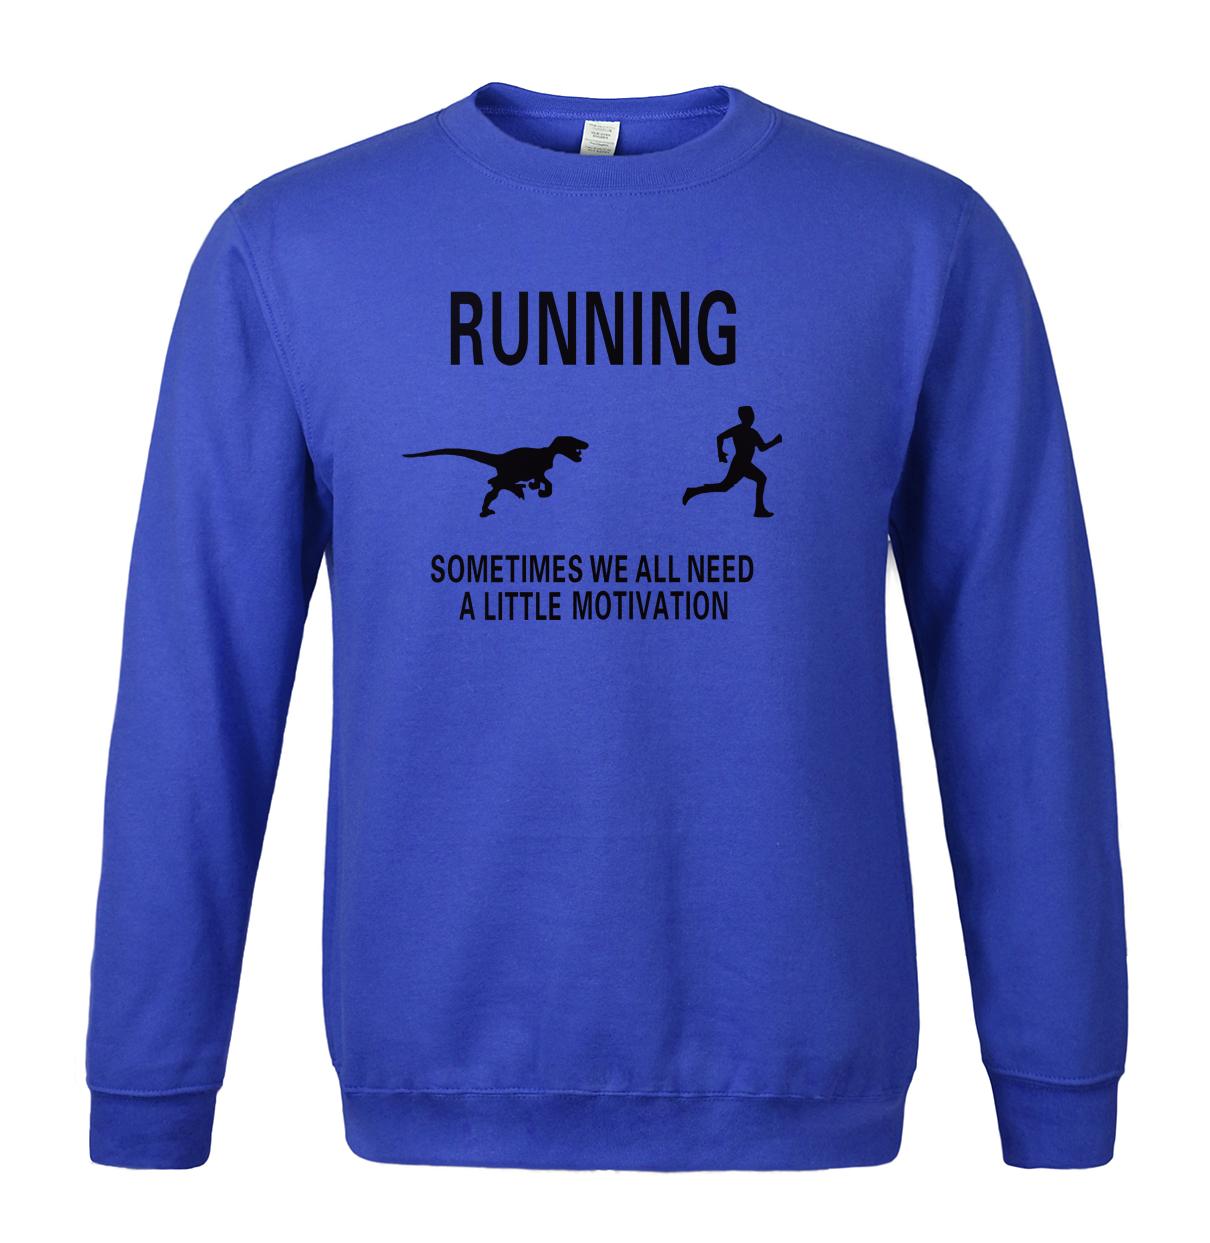 2019 Sweatshirt men's sportswear motivation print printed spring winter fleece hoody men sweatshirts harajuku brand-clothing